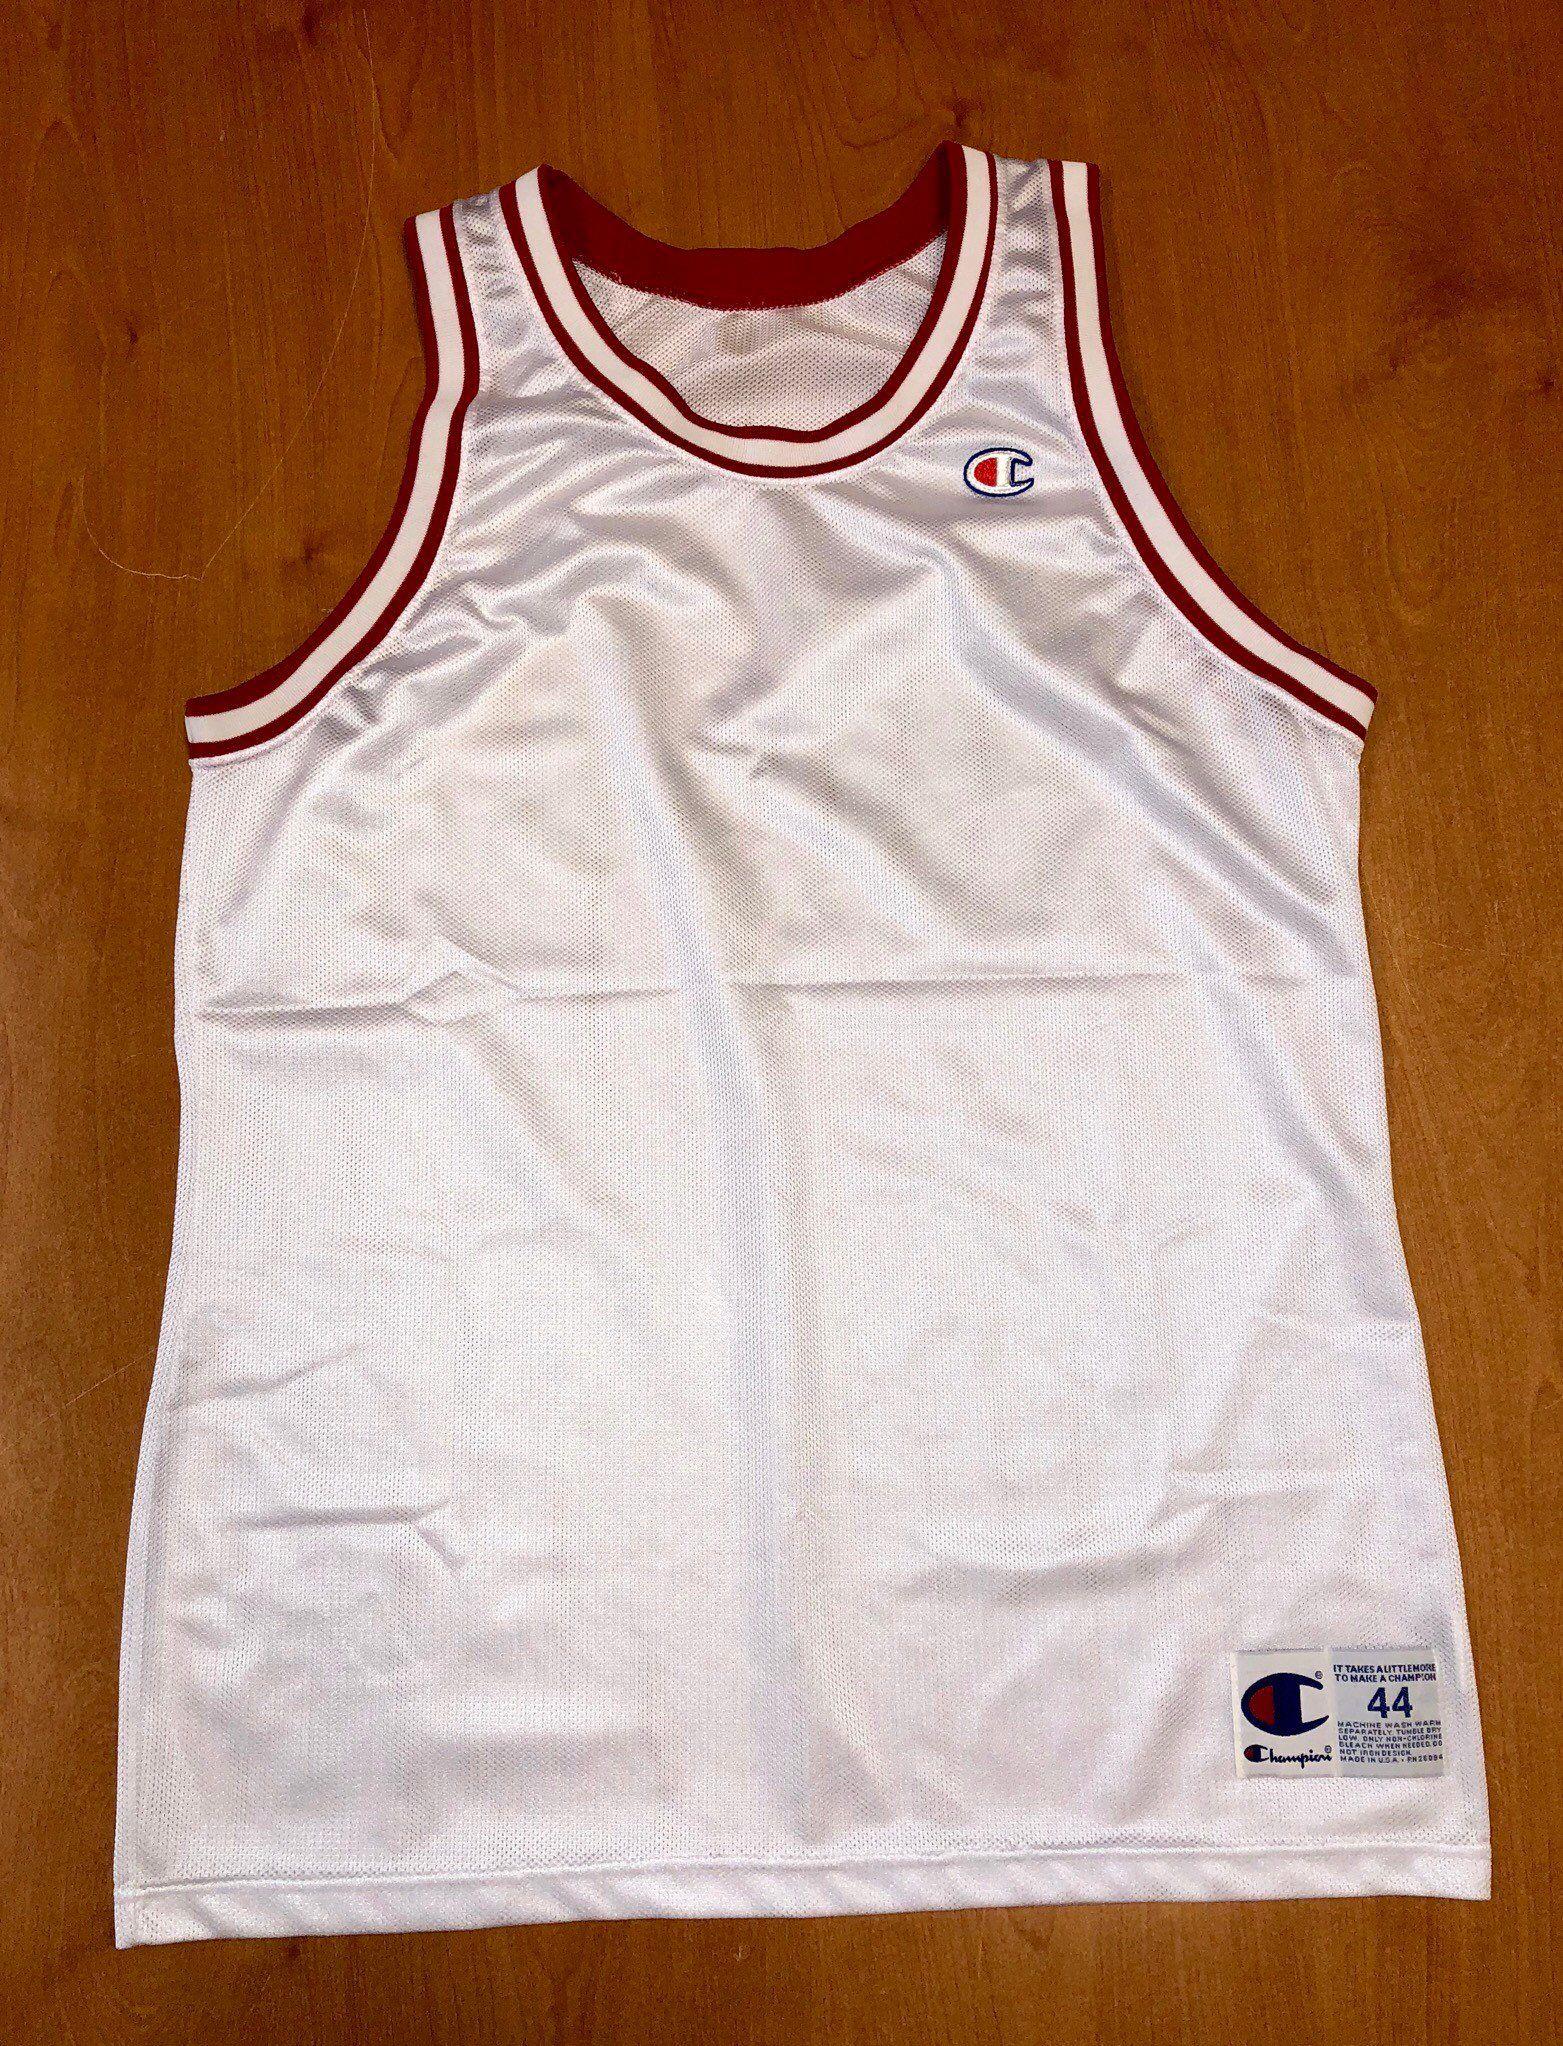 Vintage 1991 - 1998 Chicago Bulls Blank Champion Jersey Size 44 nba finals  hat shirt scottie pippen authentic michael jordan elton brand by ... 3b928b677